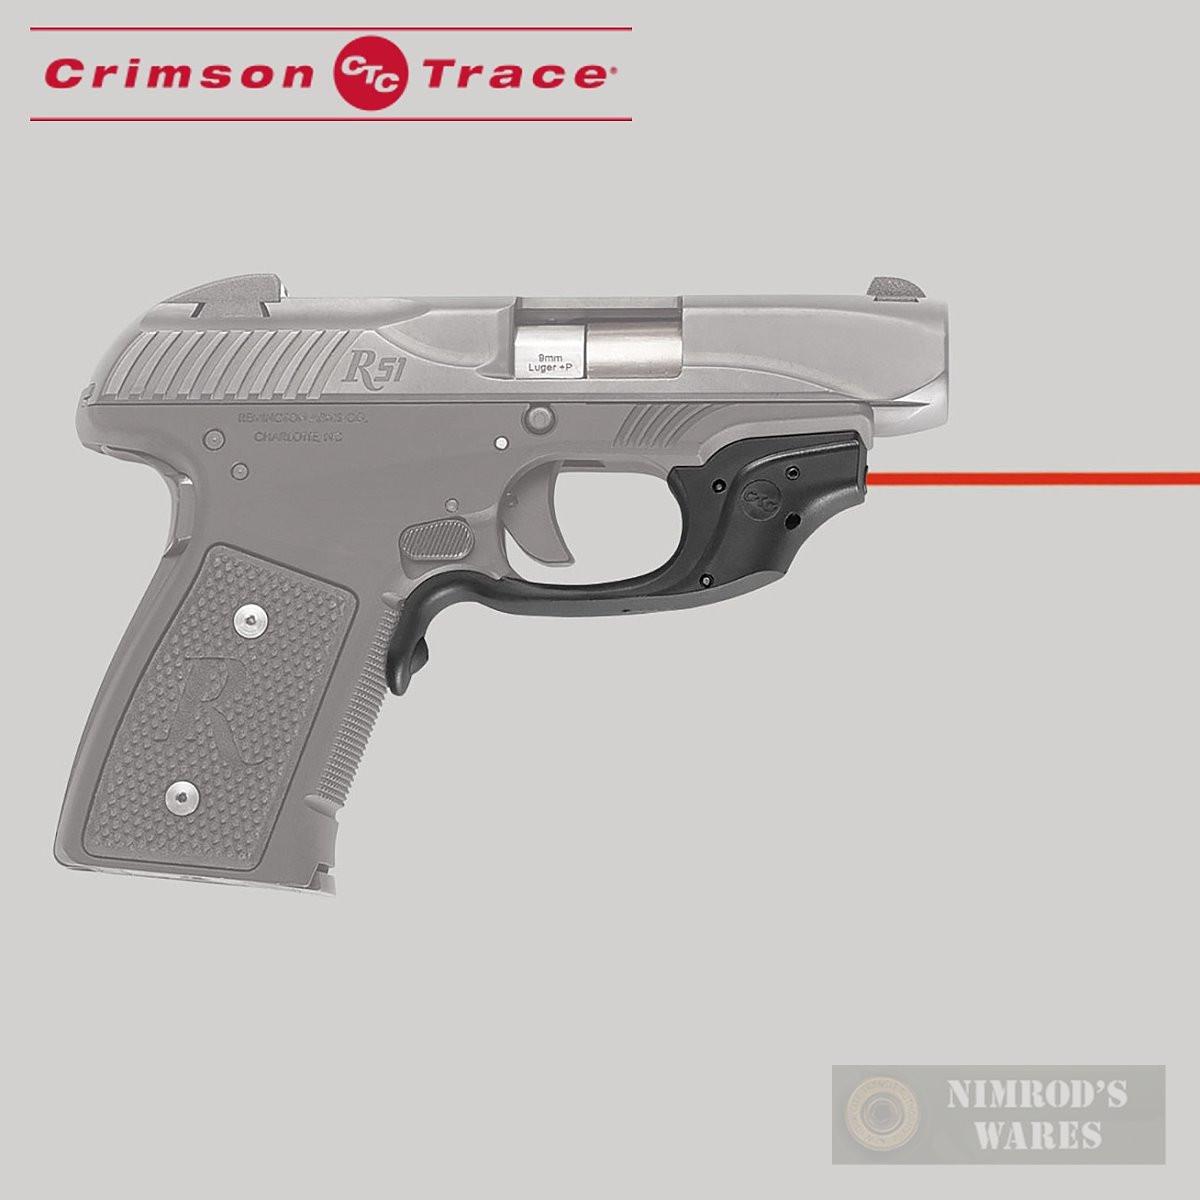 Crimson Trace REMINGTON R51 LaserGuard LASER SIGHT LG-494